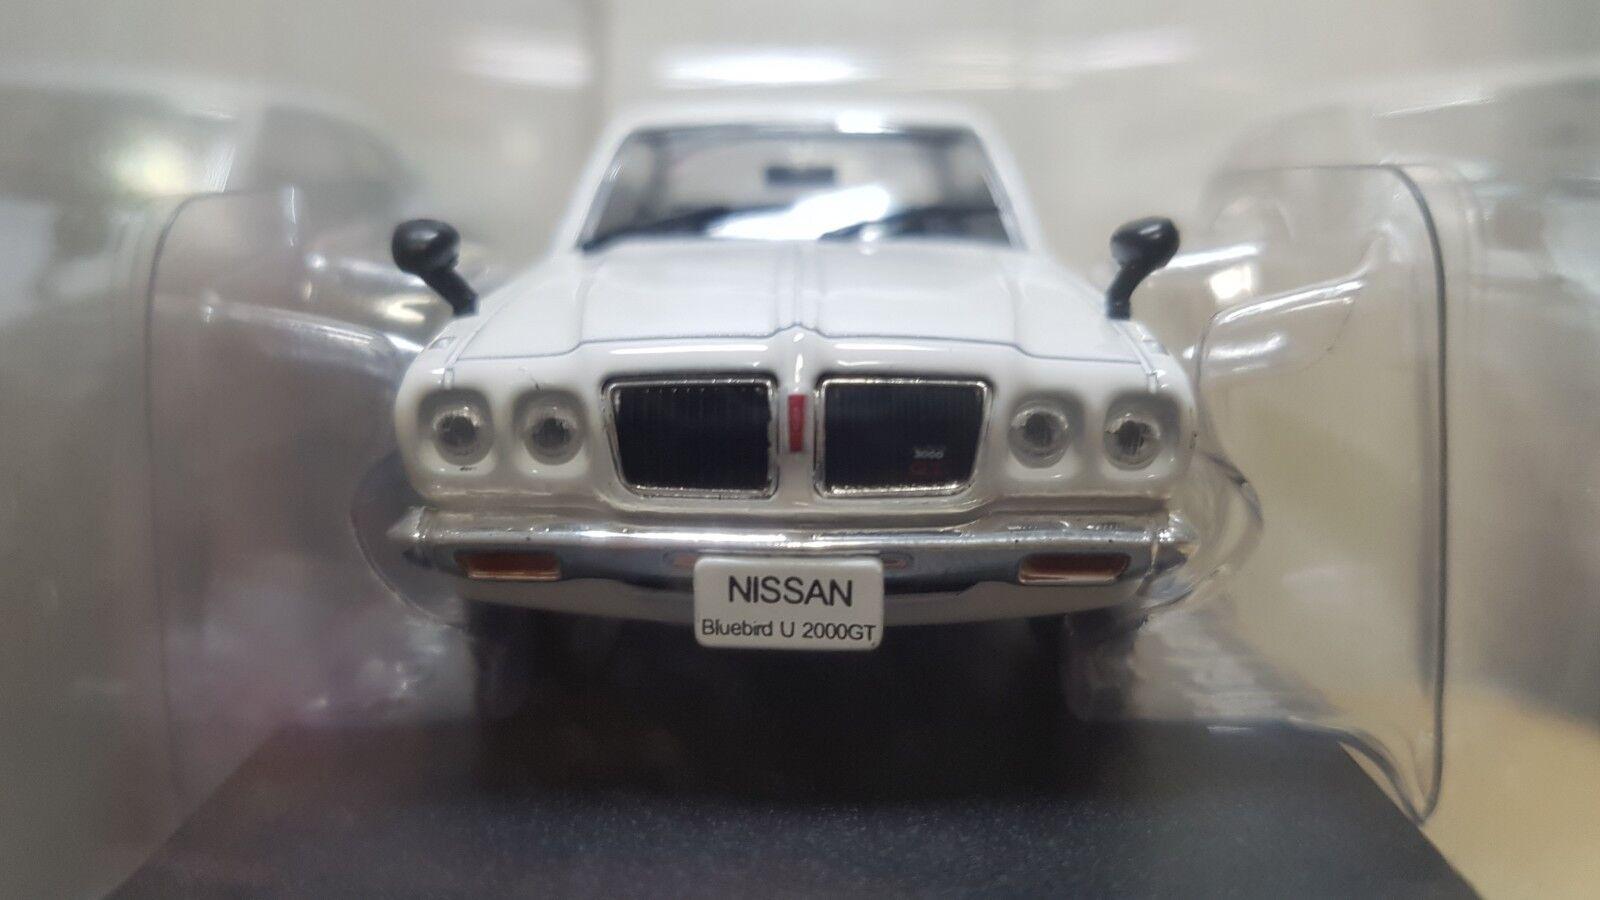 1 43 43 43 Norev 1973 NISSAN blueEBIRD U 2000GT WHITE diecast car model NEW 68f423